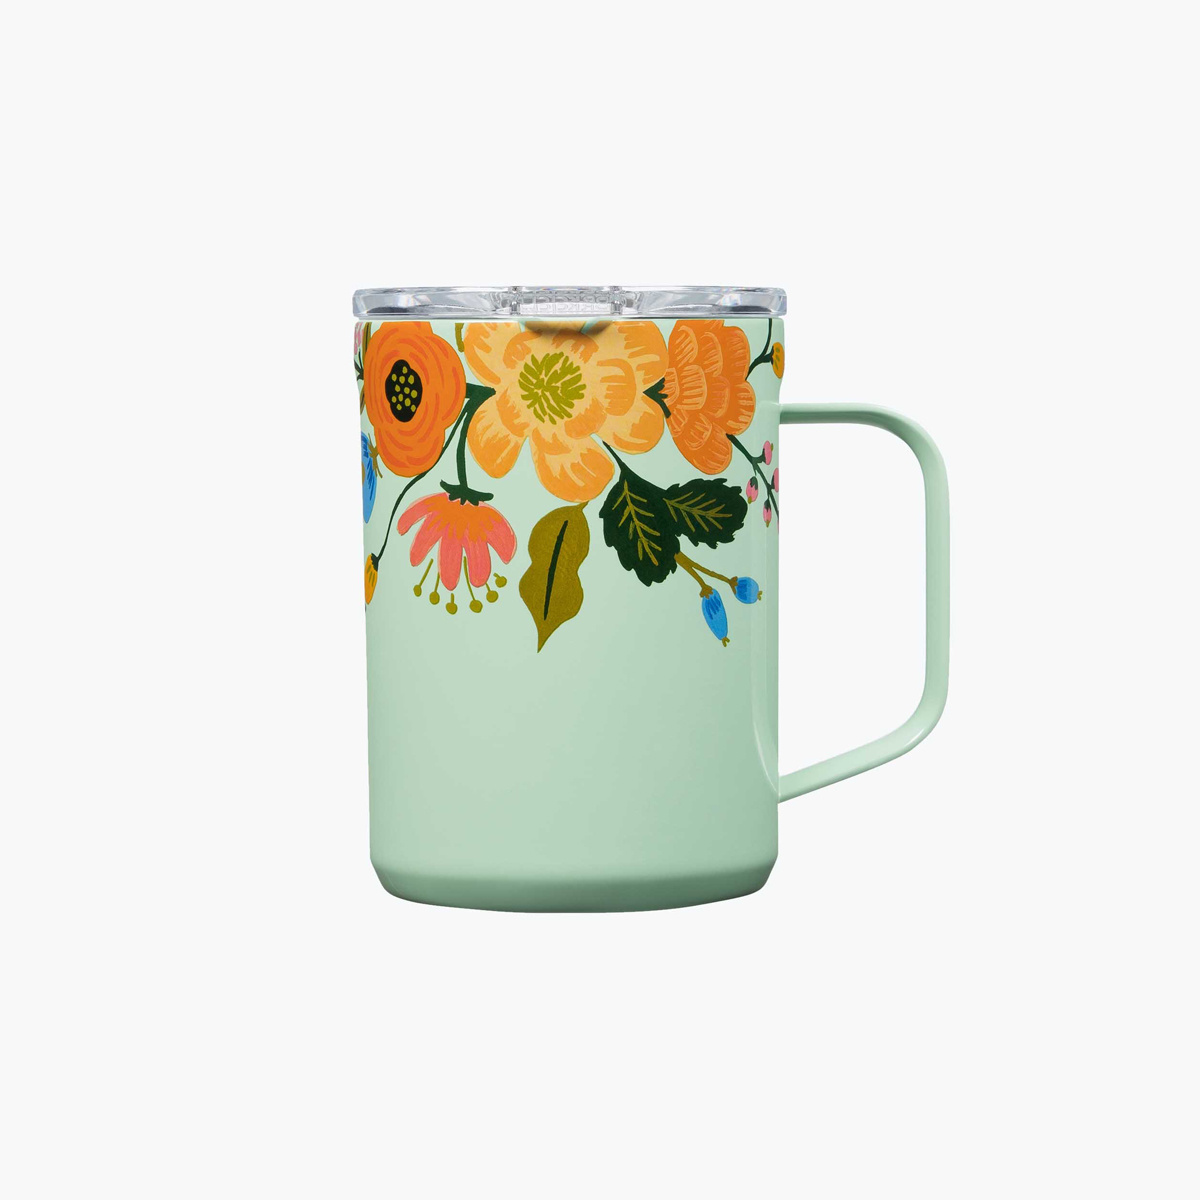 Corkcicle - CO Corkcicle x Rifle Paper Co - Mint Lively Floral Mug